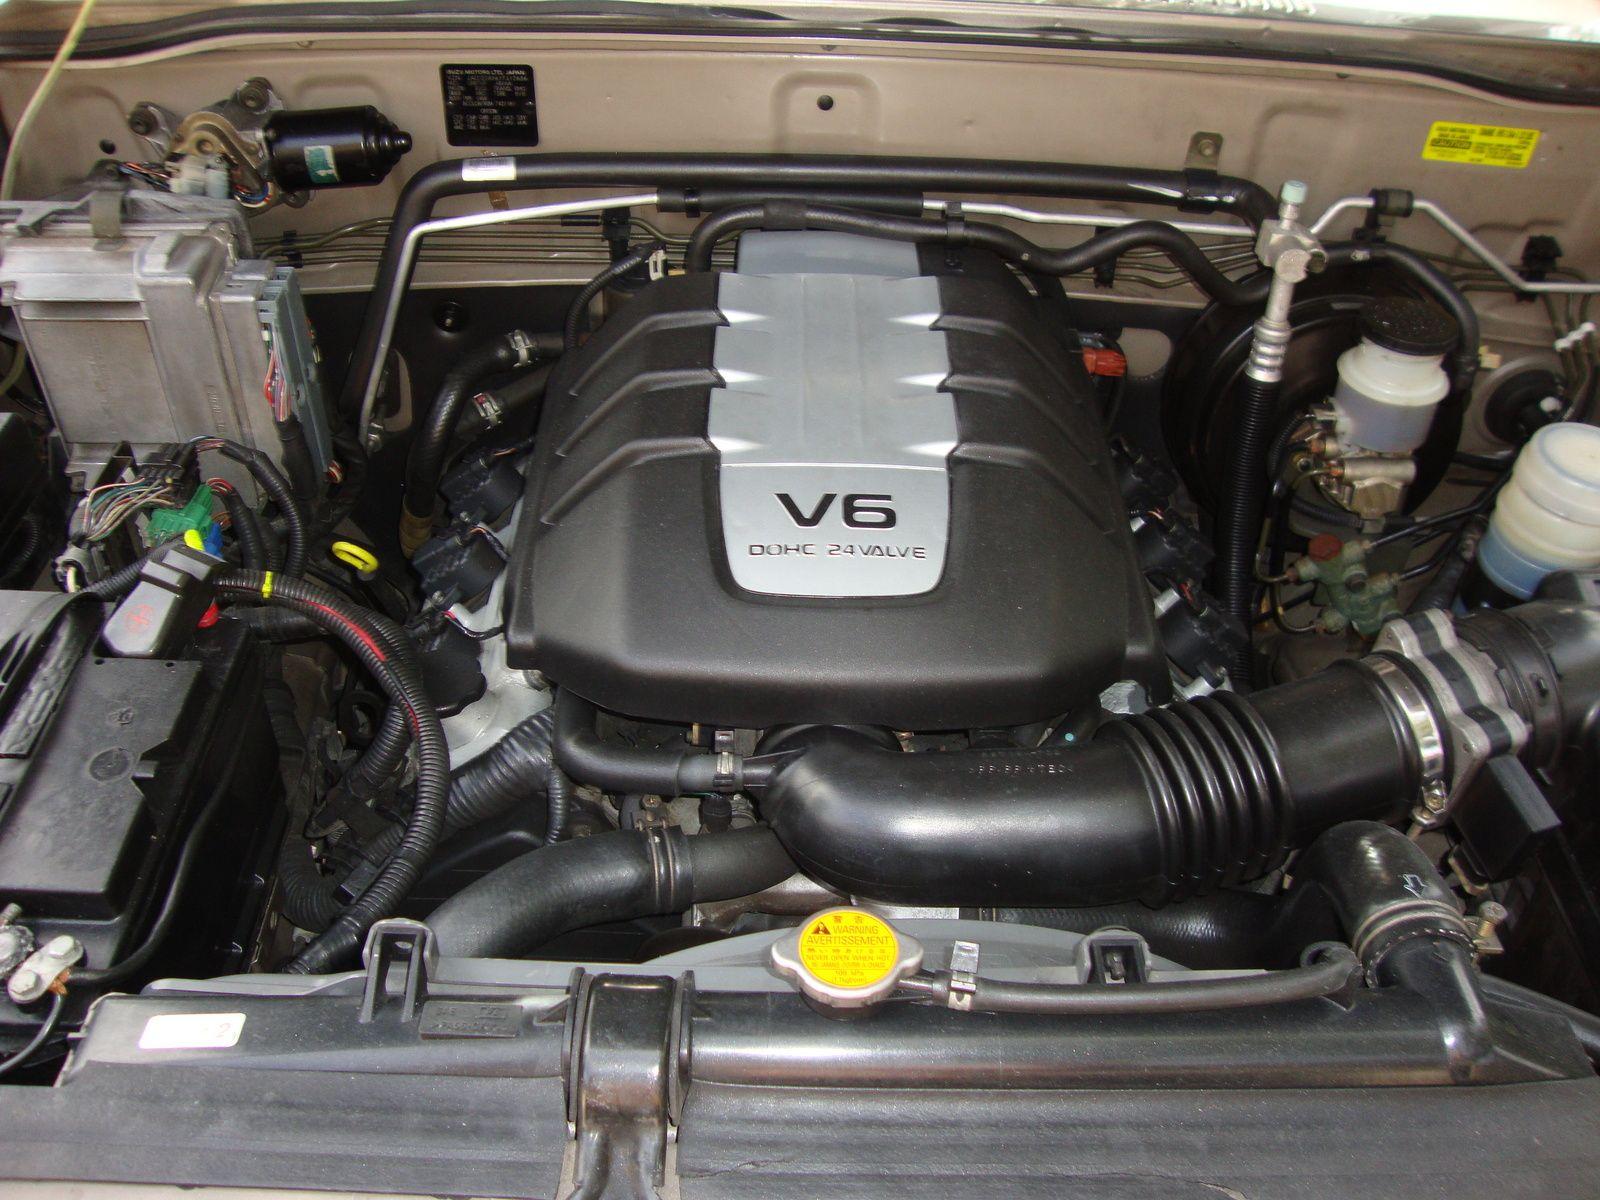 2002 isuzu trooper used engine description 3 5l 6 cyl vin x